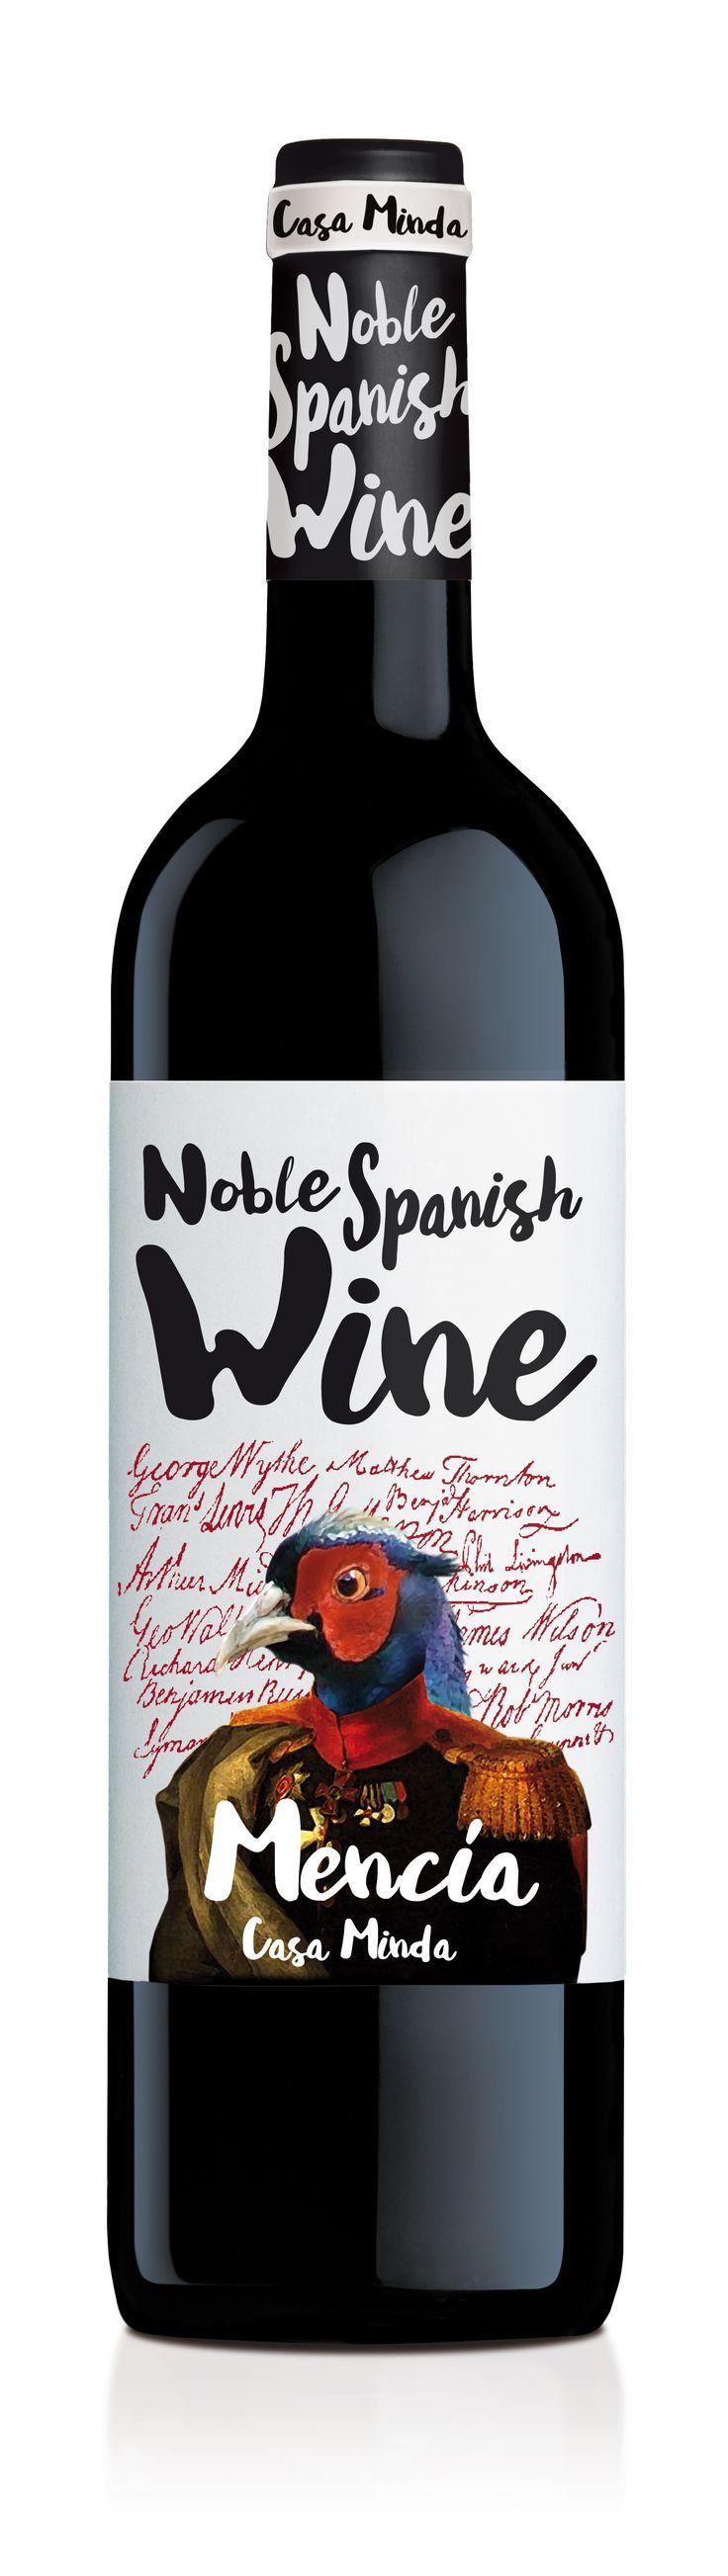 Mencía • Noble Spanish Wine